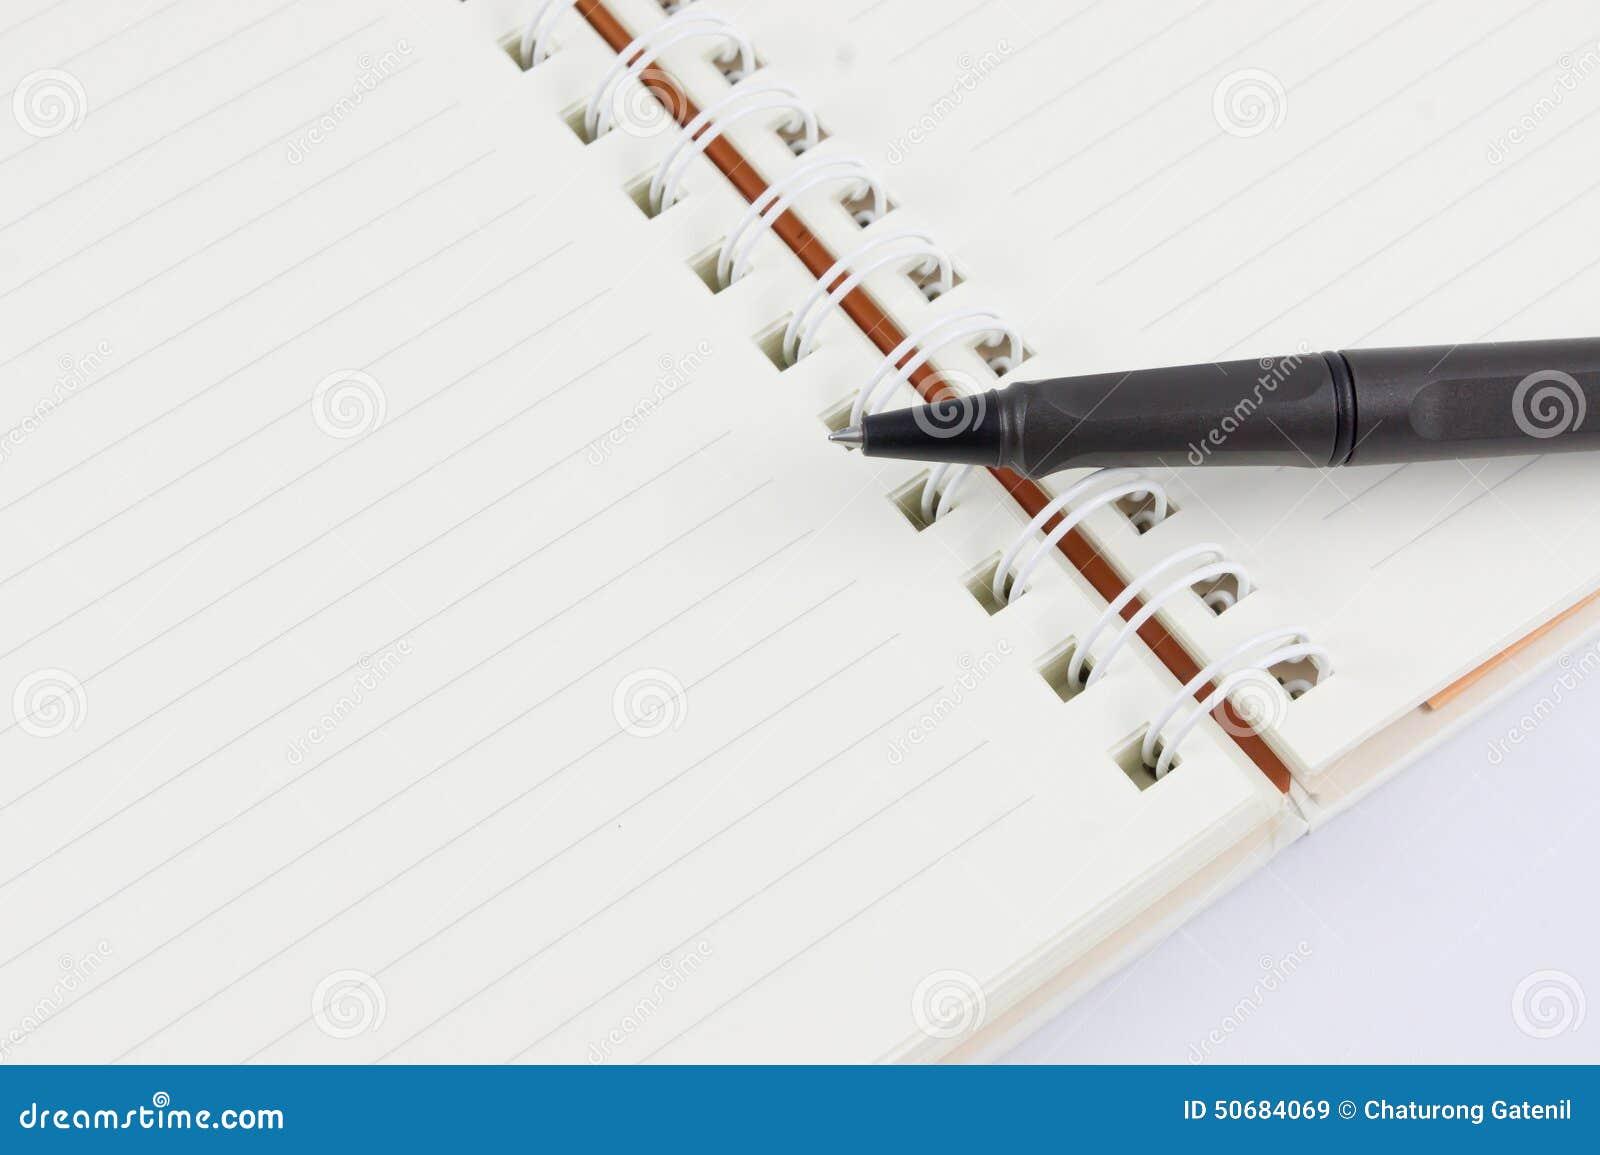 Download 笔记本和黑笔 库存图片. 图片 包括有 学院, 对象, 空白的, 办公室, 橙色, 投反对票, 填充, 附注 - 50684069